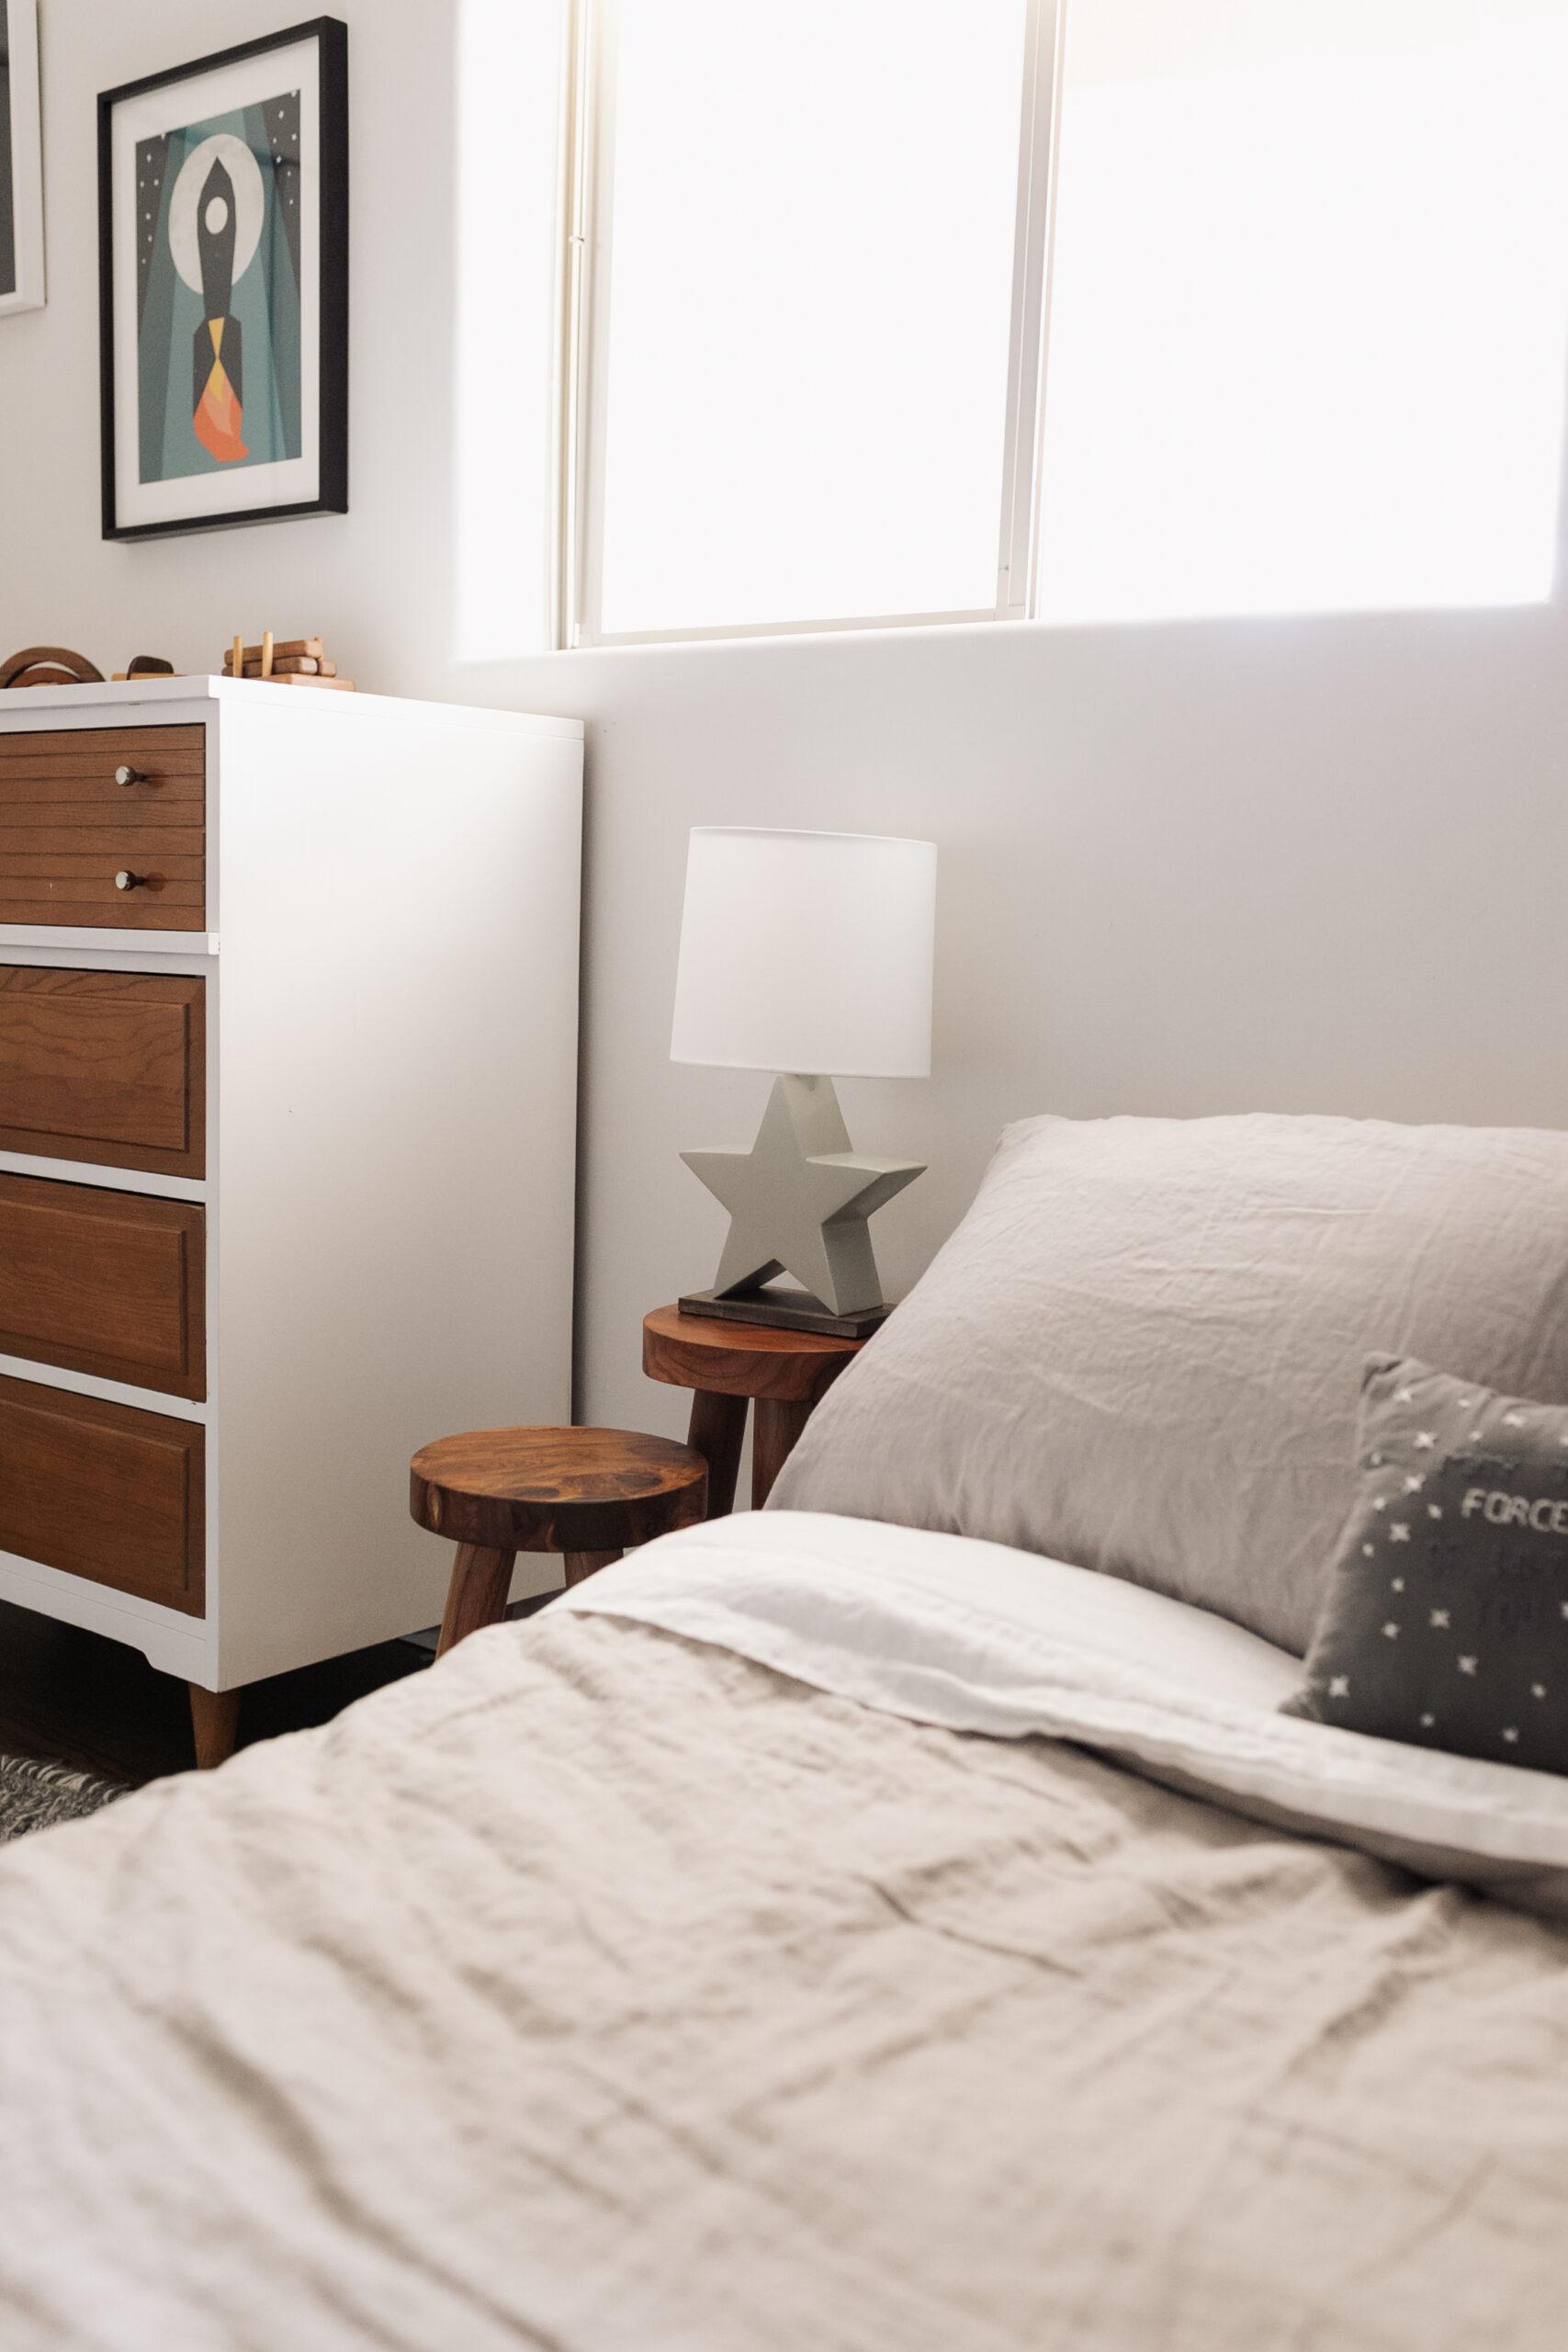 sweet space inspired bedroom #theldlhome #homedesign #kidsroom #linenbedding